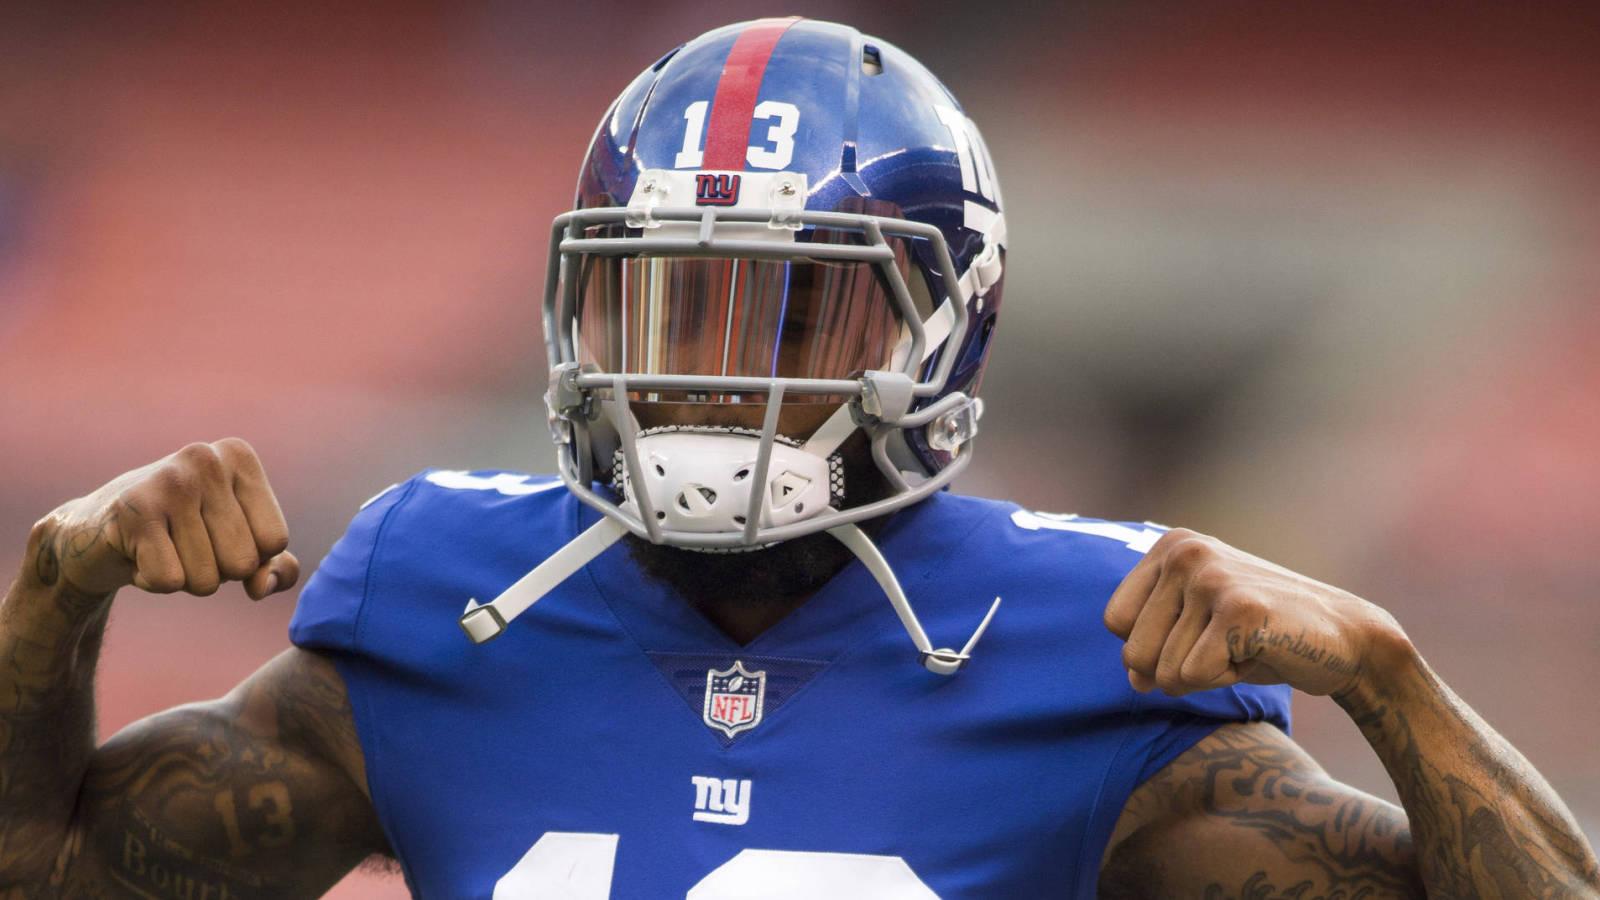 Giants WR Odell Beckham Jr could be sidelined for season ...